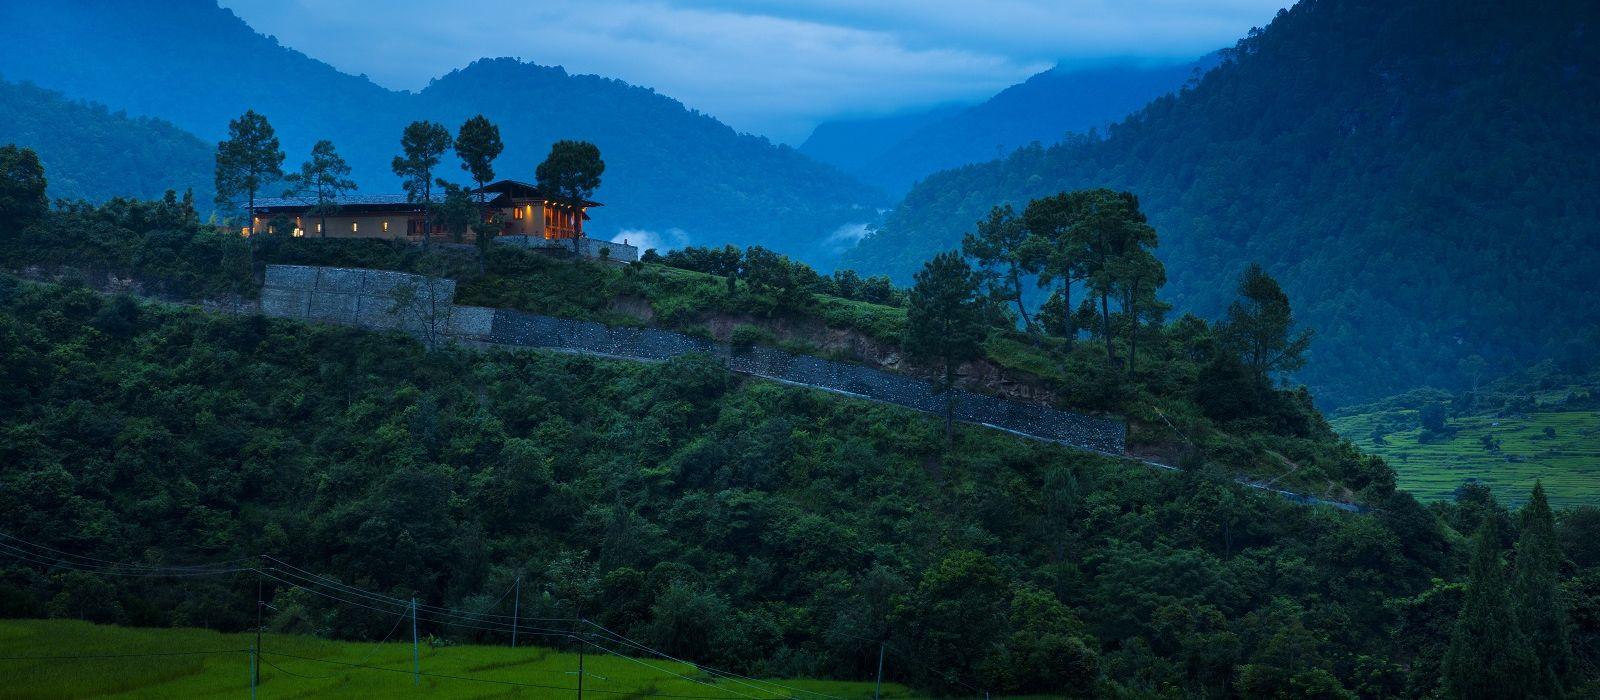 Luxury Bhutan and Thailand Paradise Islands Tour Trip 7